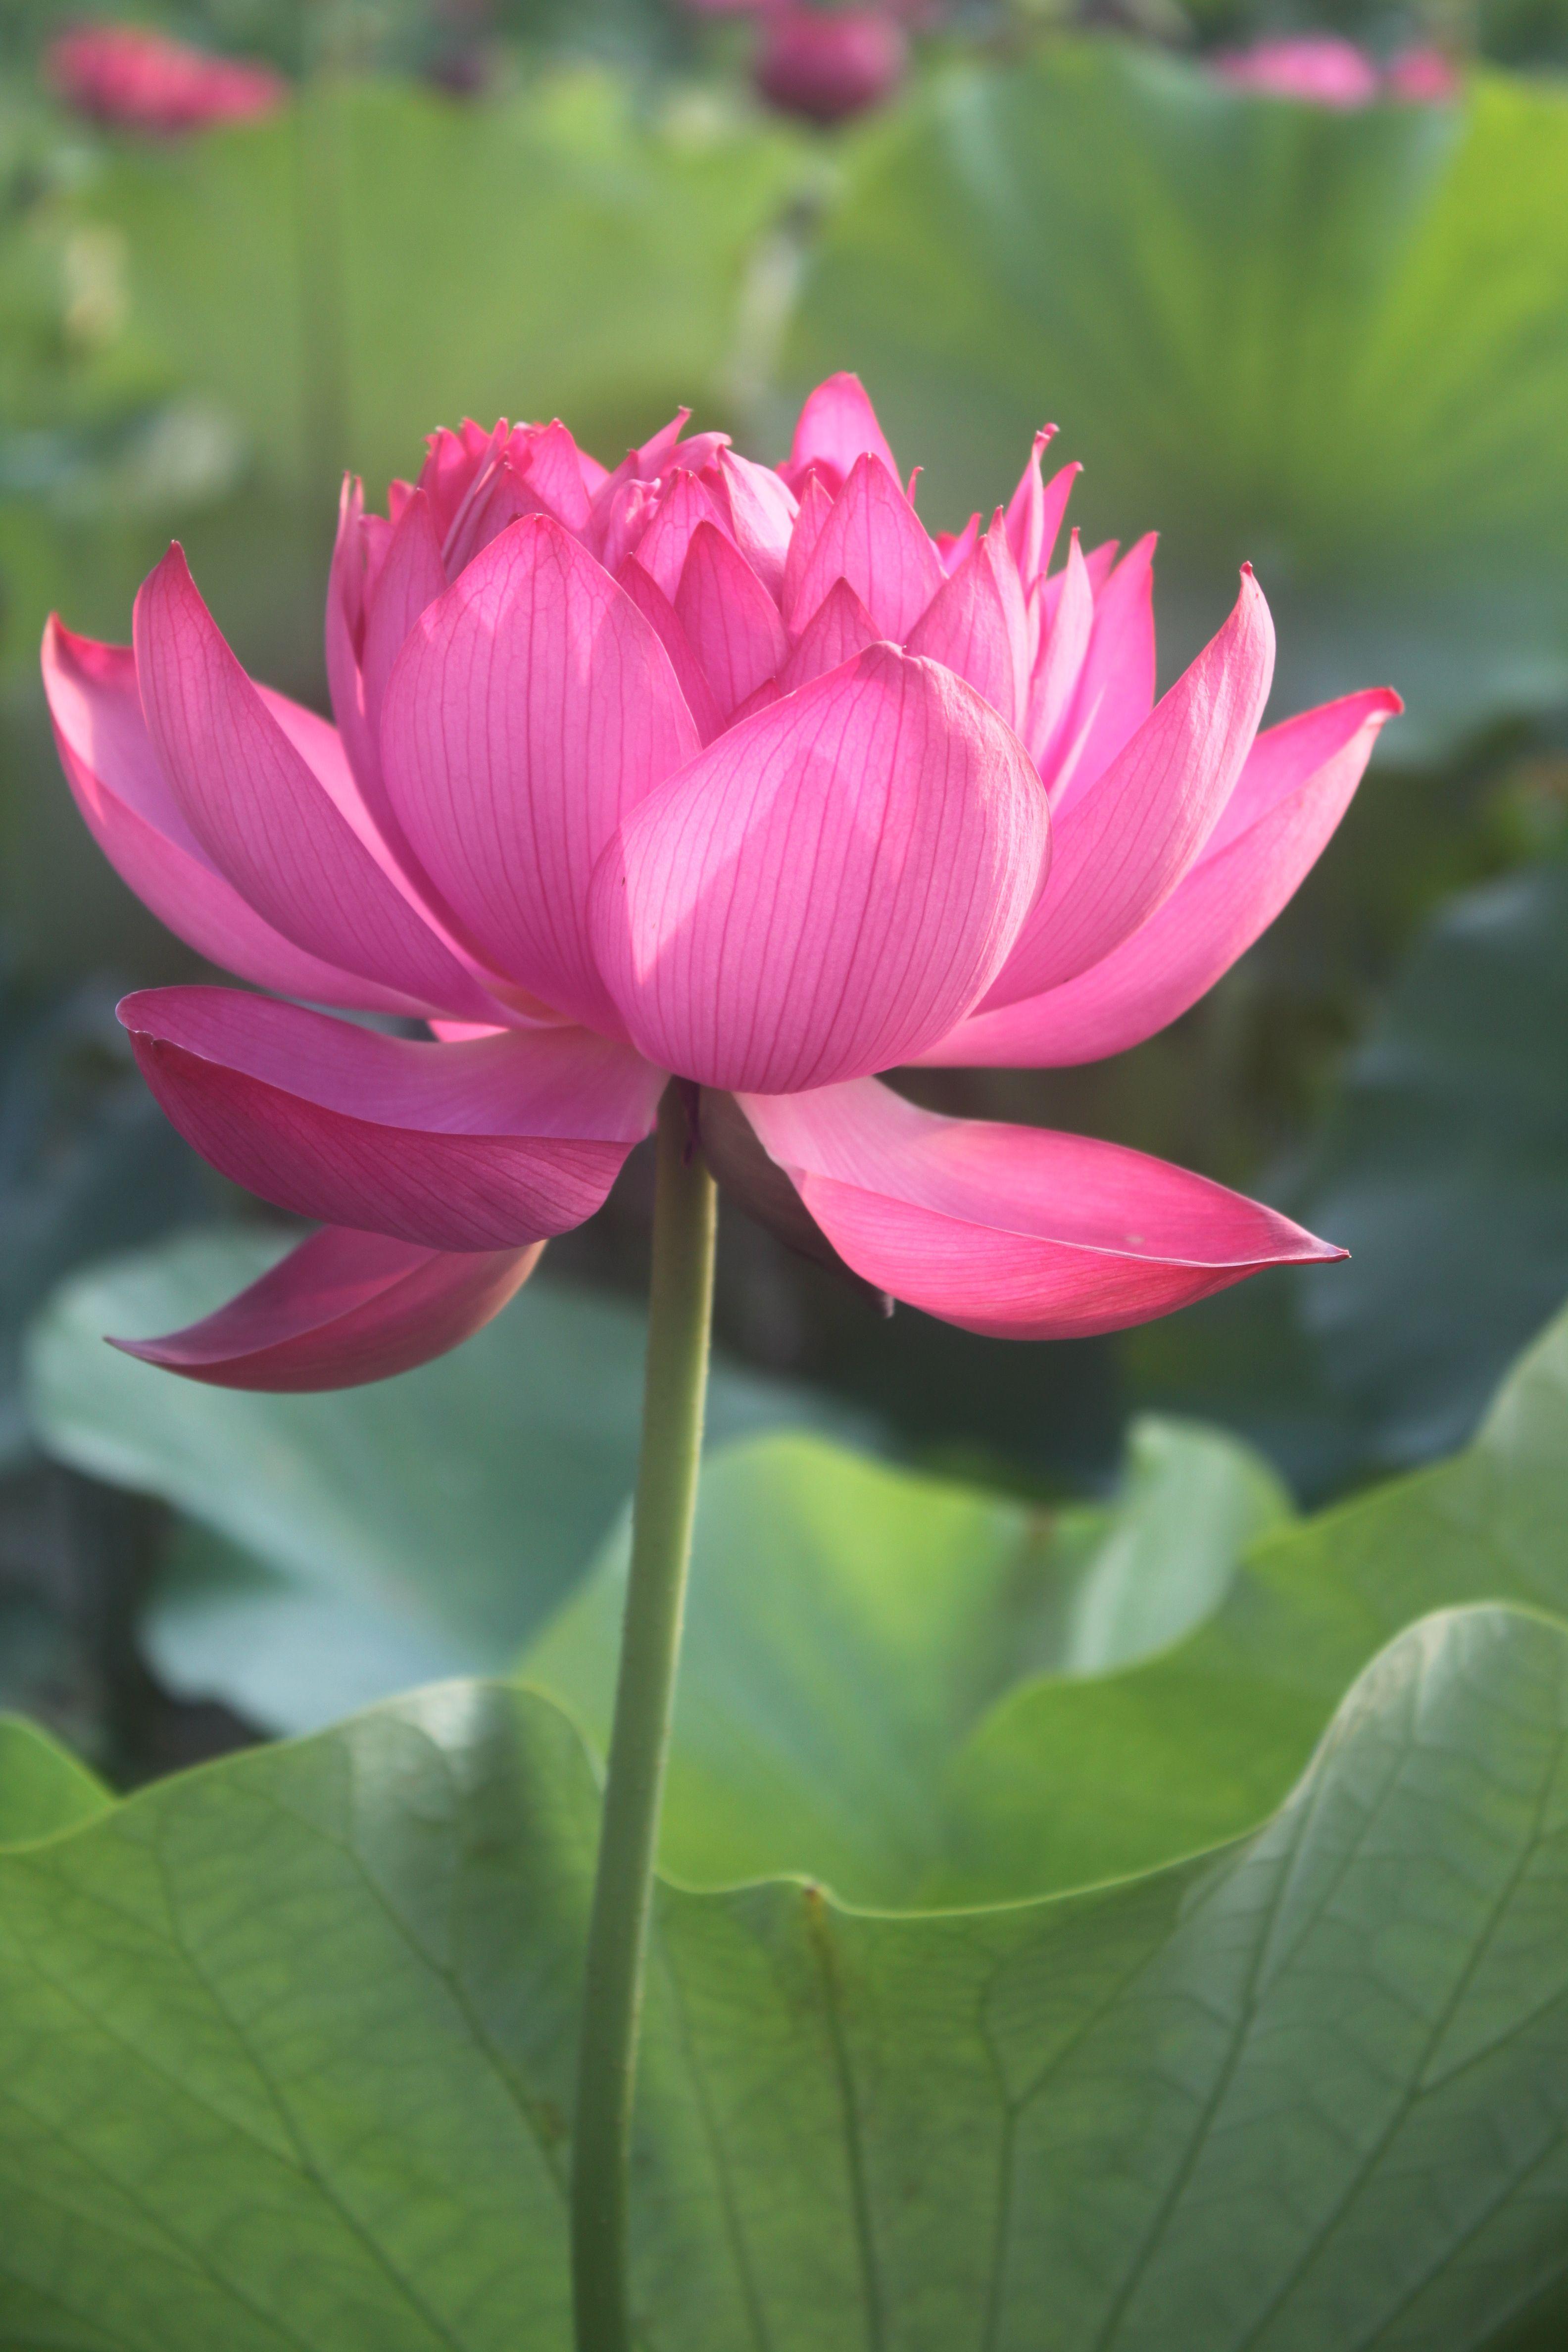 Chinese red jinggangshan bergenwatergardens chinese lotus lotus flowers chinese red jinggangshan bergenwatergardens izmirmasajfo